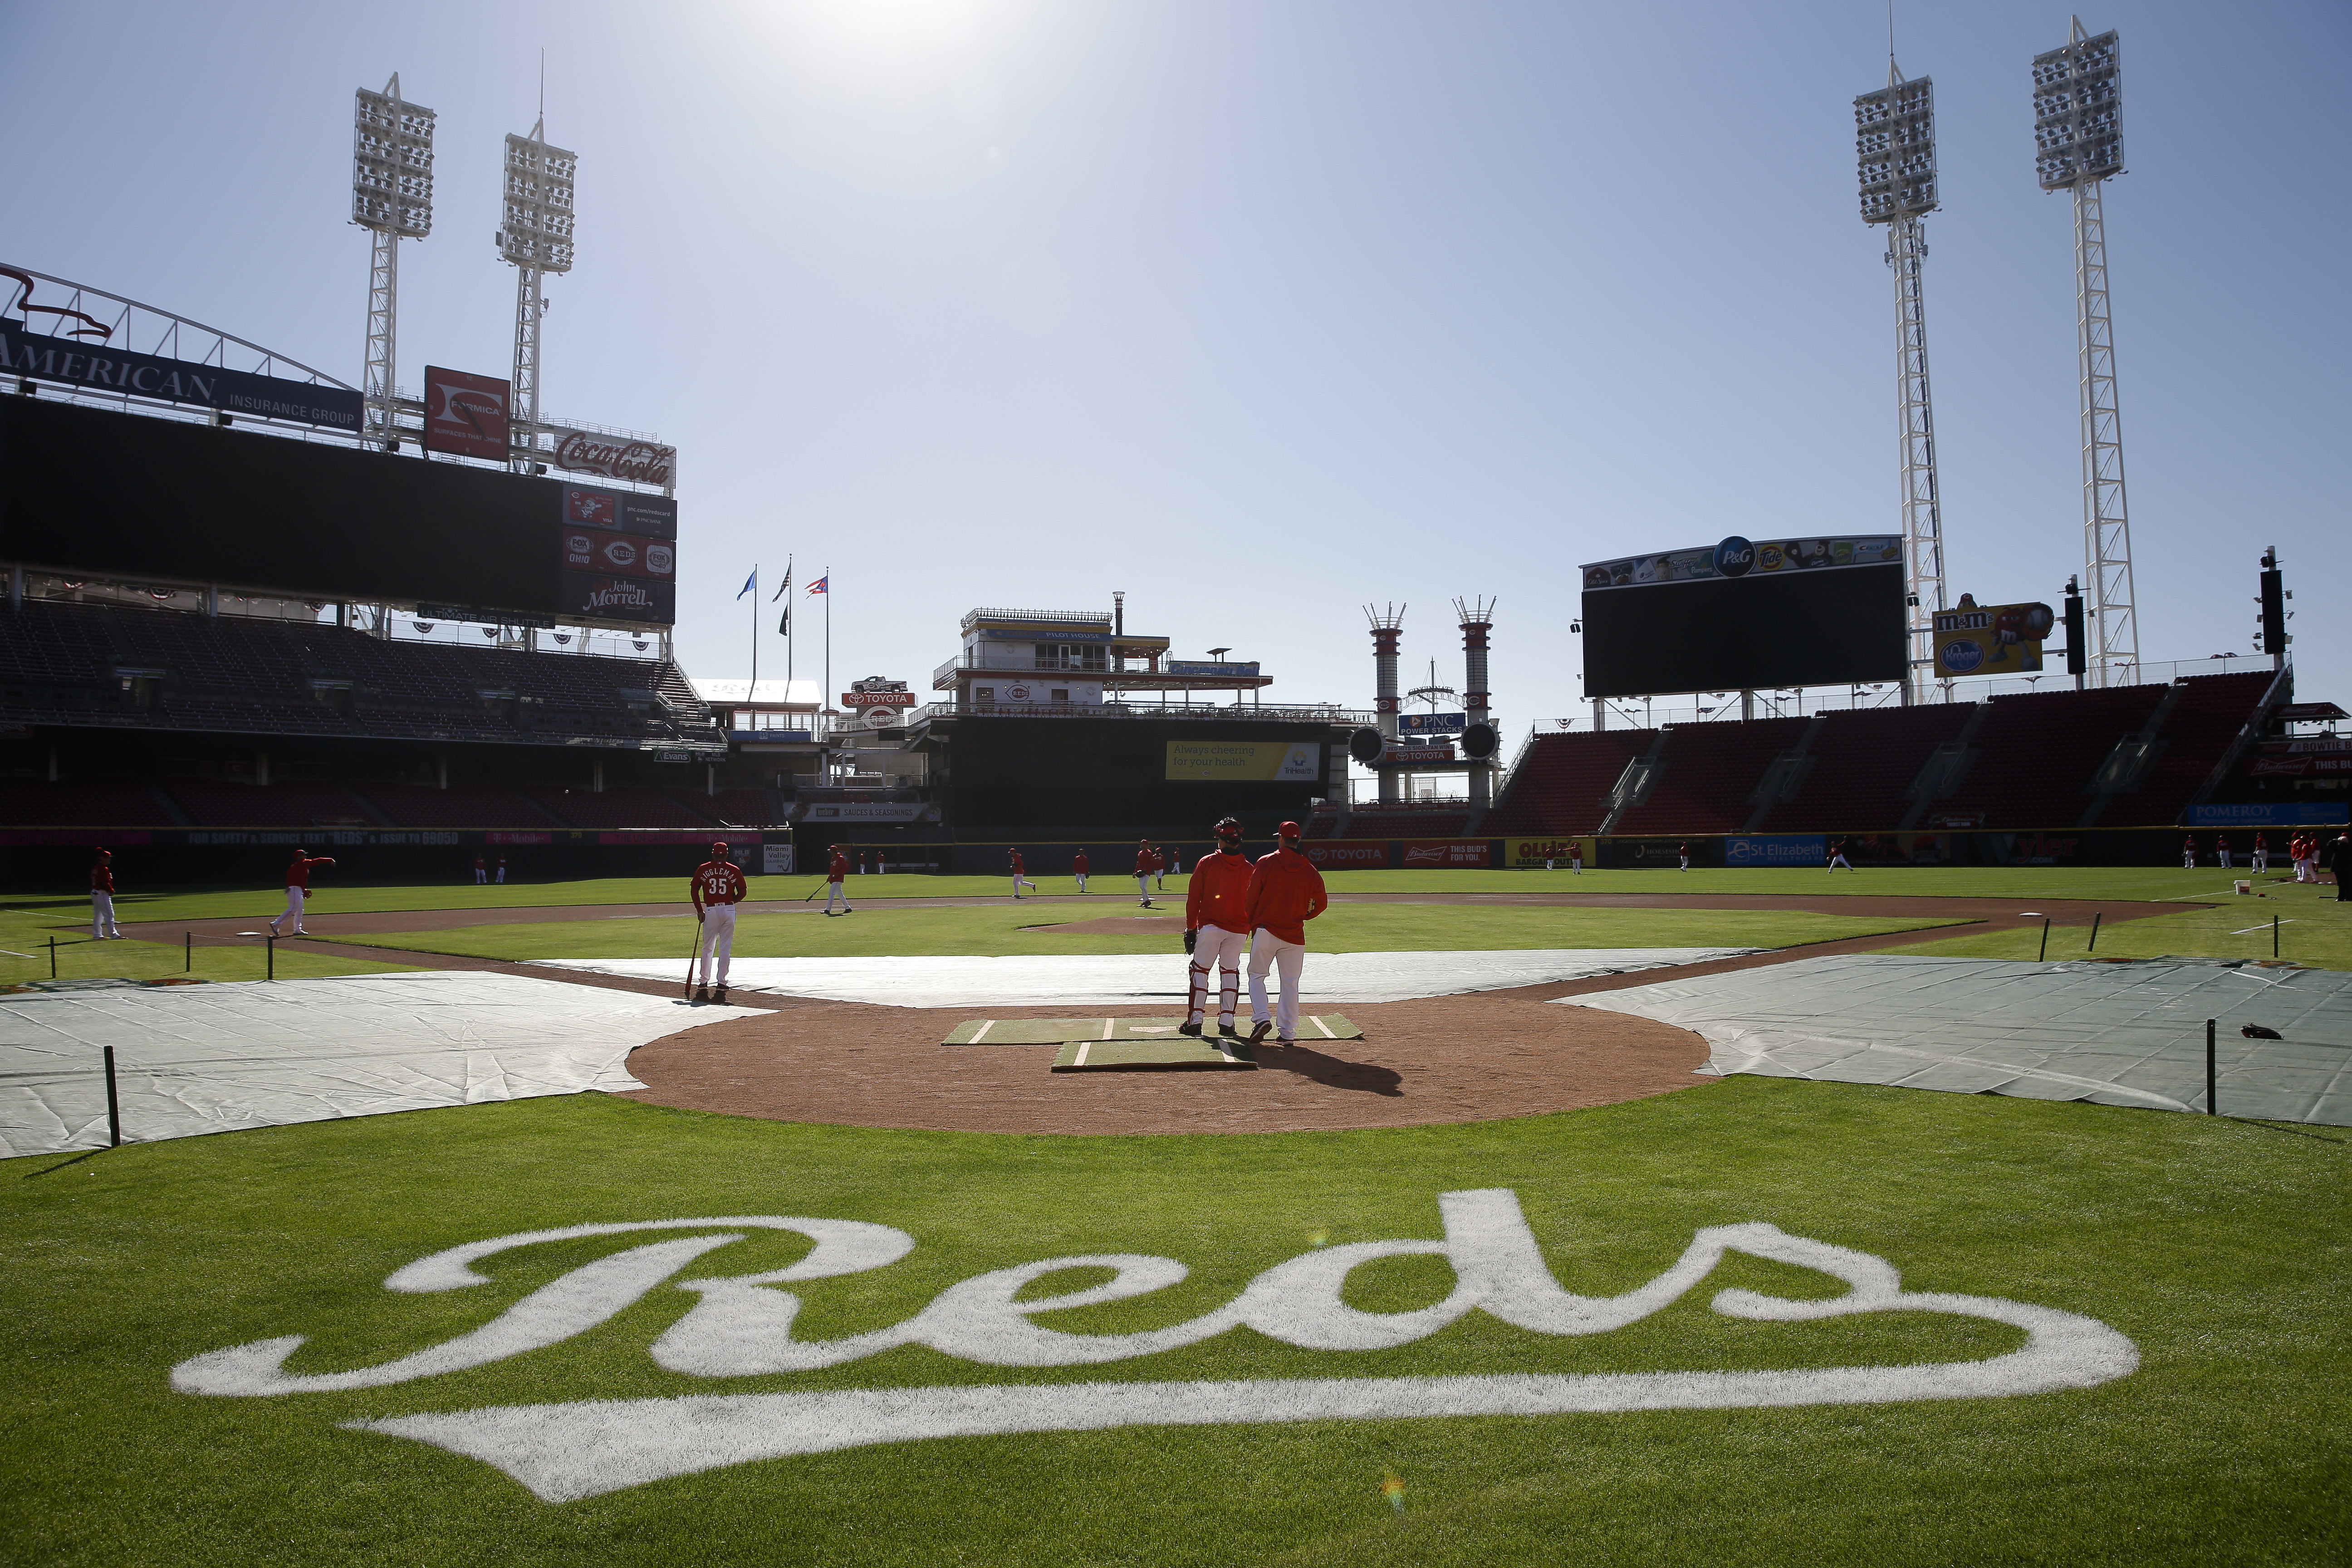 The Cincinnati Reds stand on the field during practice at Great American Ballpark, Sunday, April 3, 2016, in Cincinnati. (AP Photo/John Minchillo)